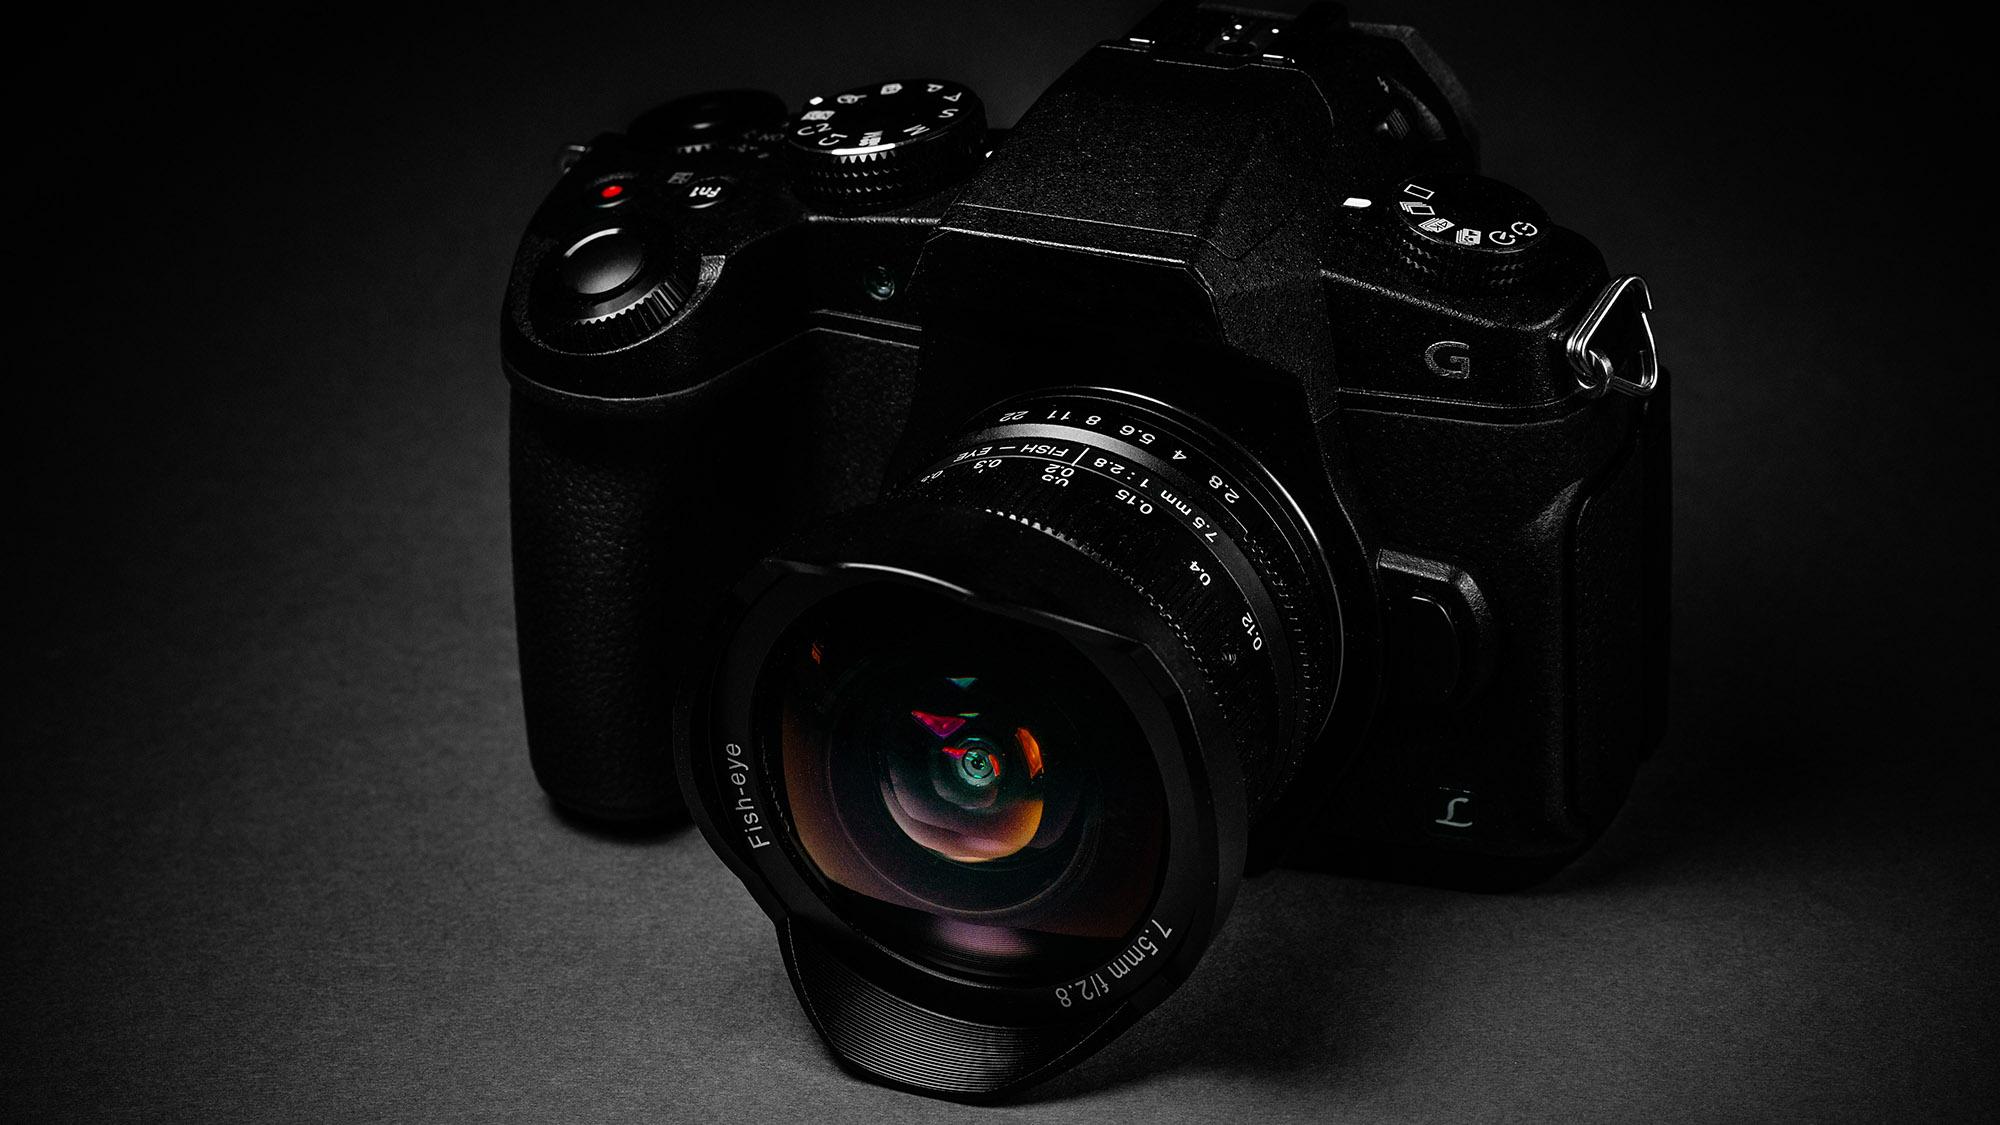 7artisans 75mm F 28 Fisheye Lens Review Vs Samyang Rokinon Bower 12mm For Fuji Black By Richard